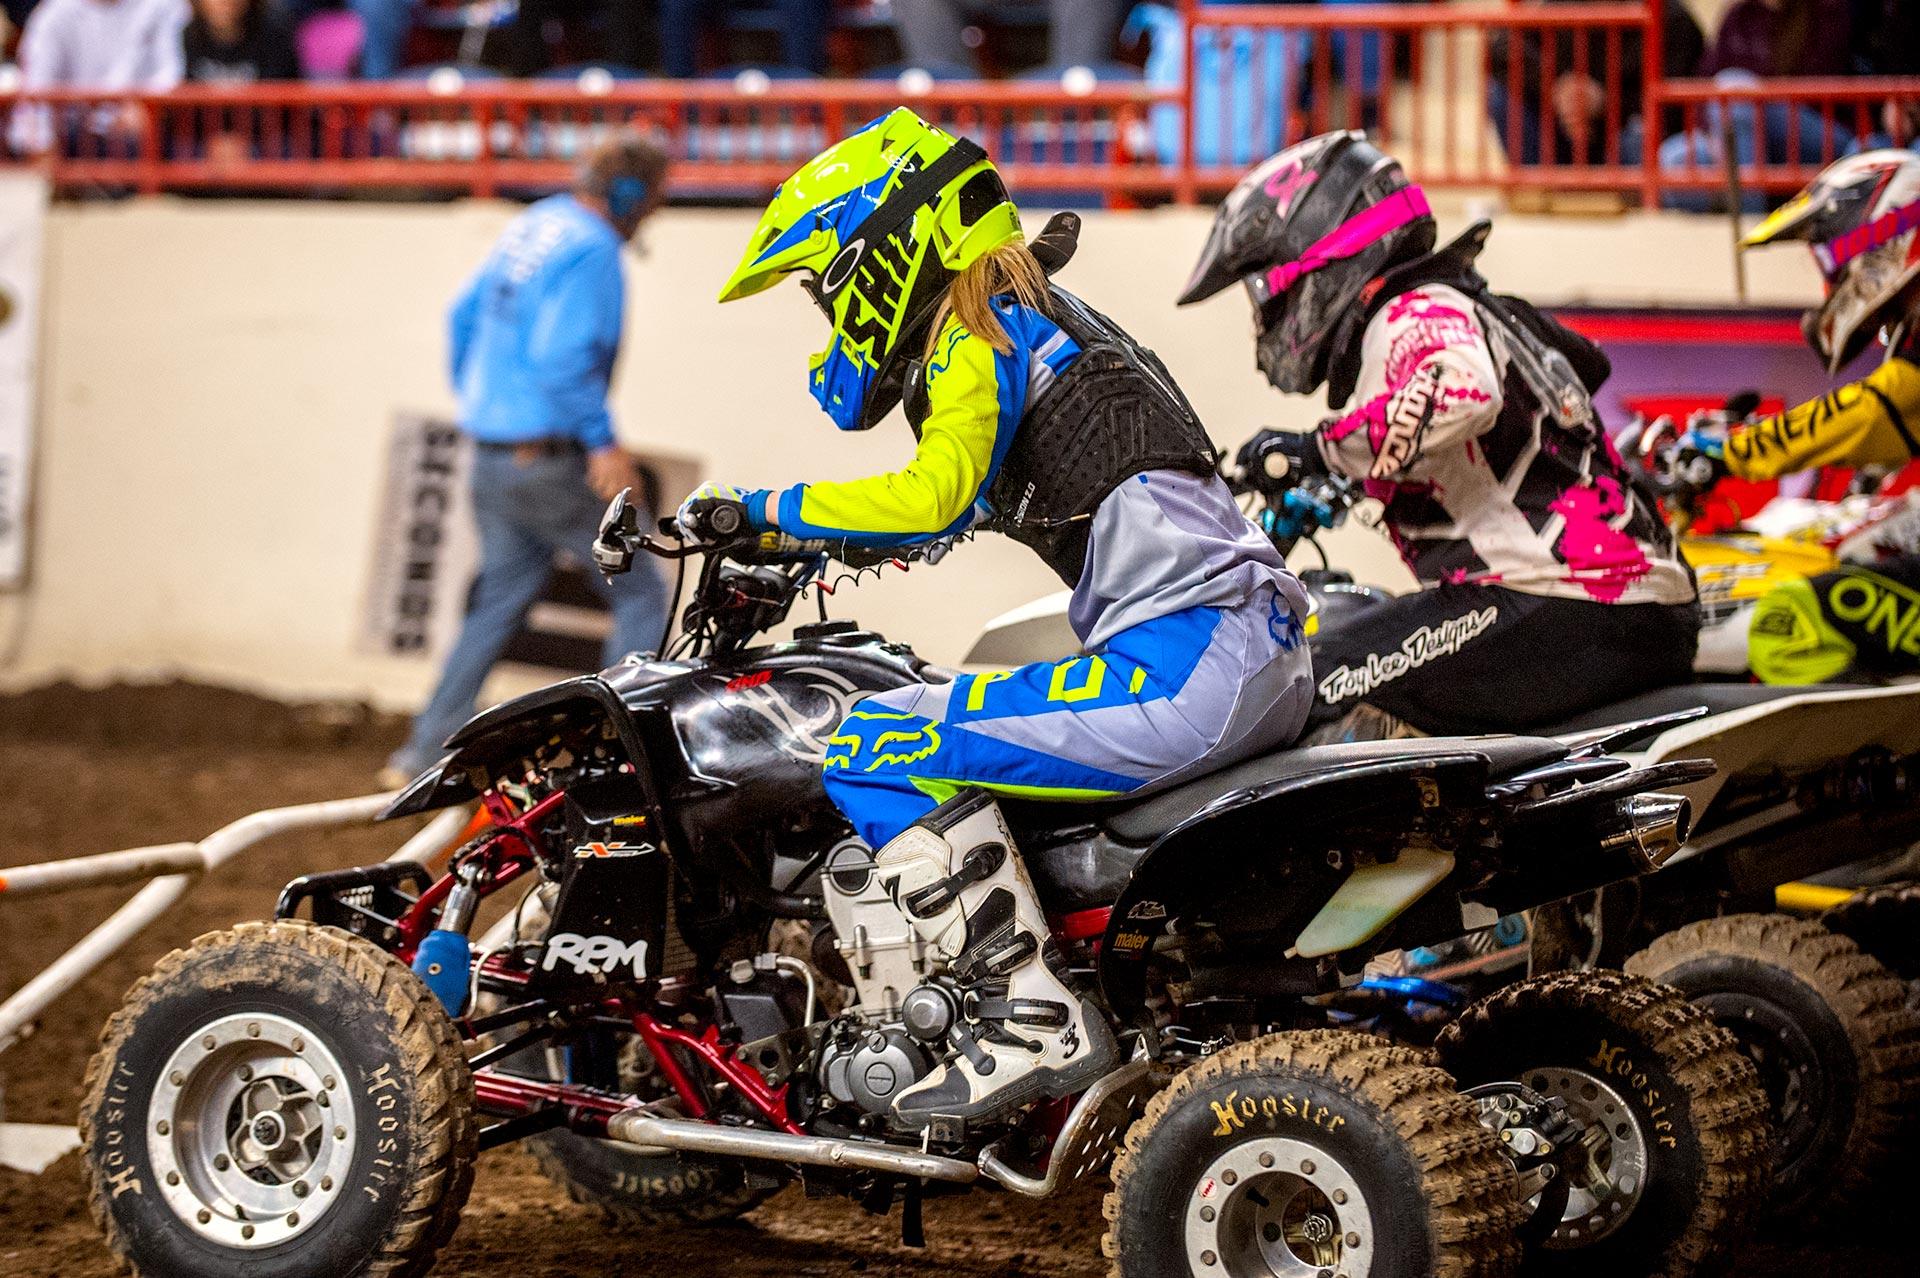 Quad racers on the starting line at Motorama 2017. Main Arena Pennsylvania Farm Show Complex, Harrisburg, PA